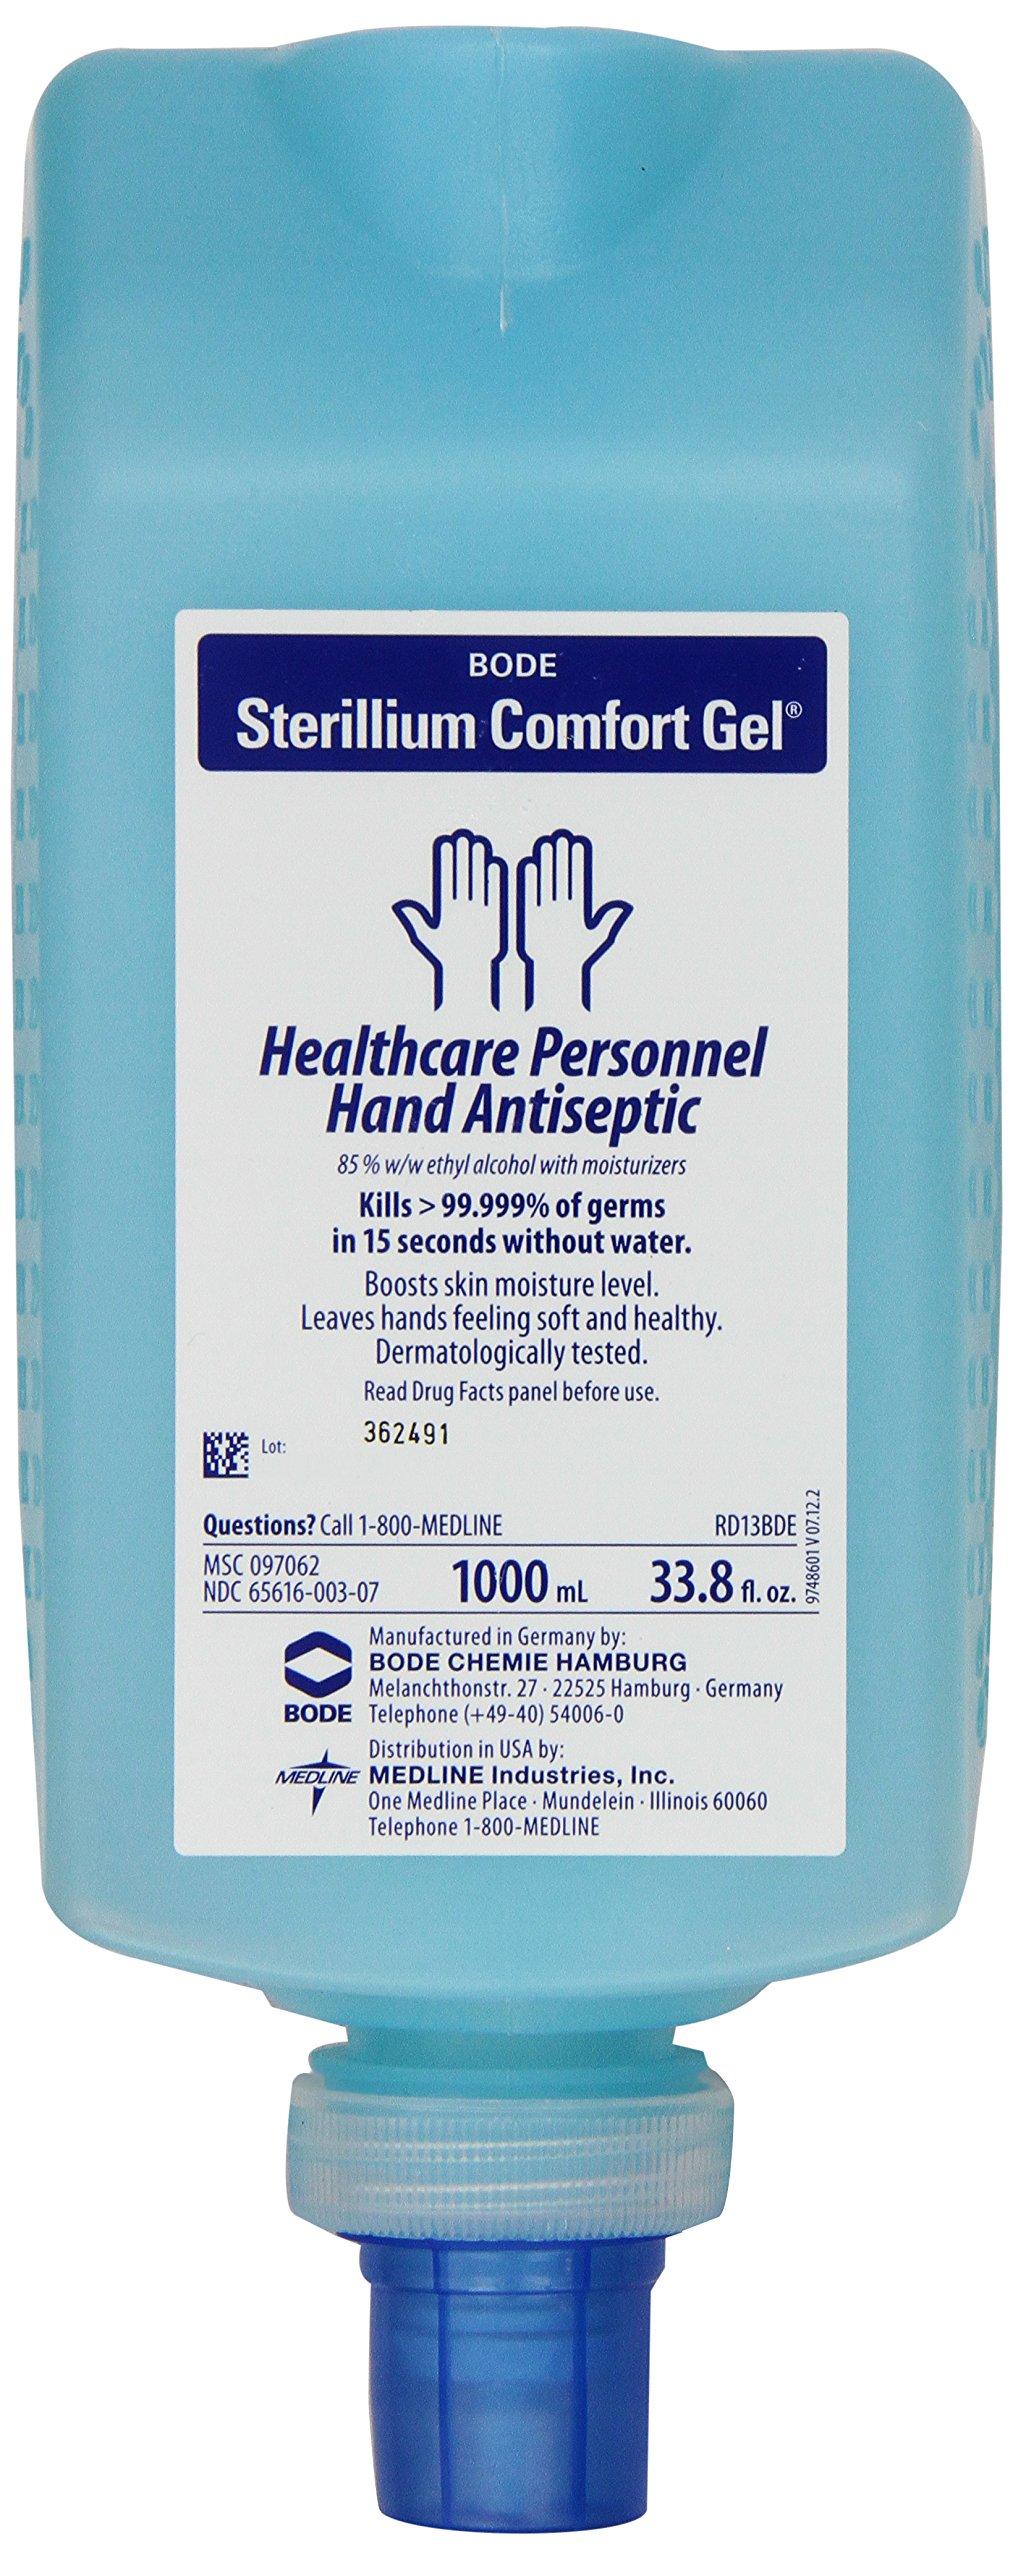 Medline Industries MSC097062 Sterillium Comfort Gel Hand Sanitizers, Latex Free, 33.8 oz., Clear (Pack of 8)